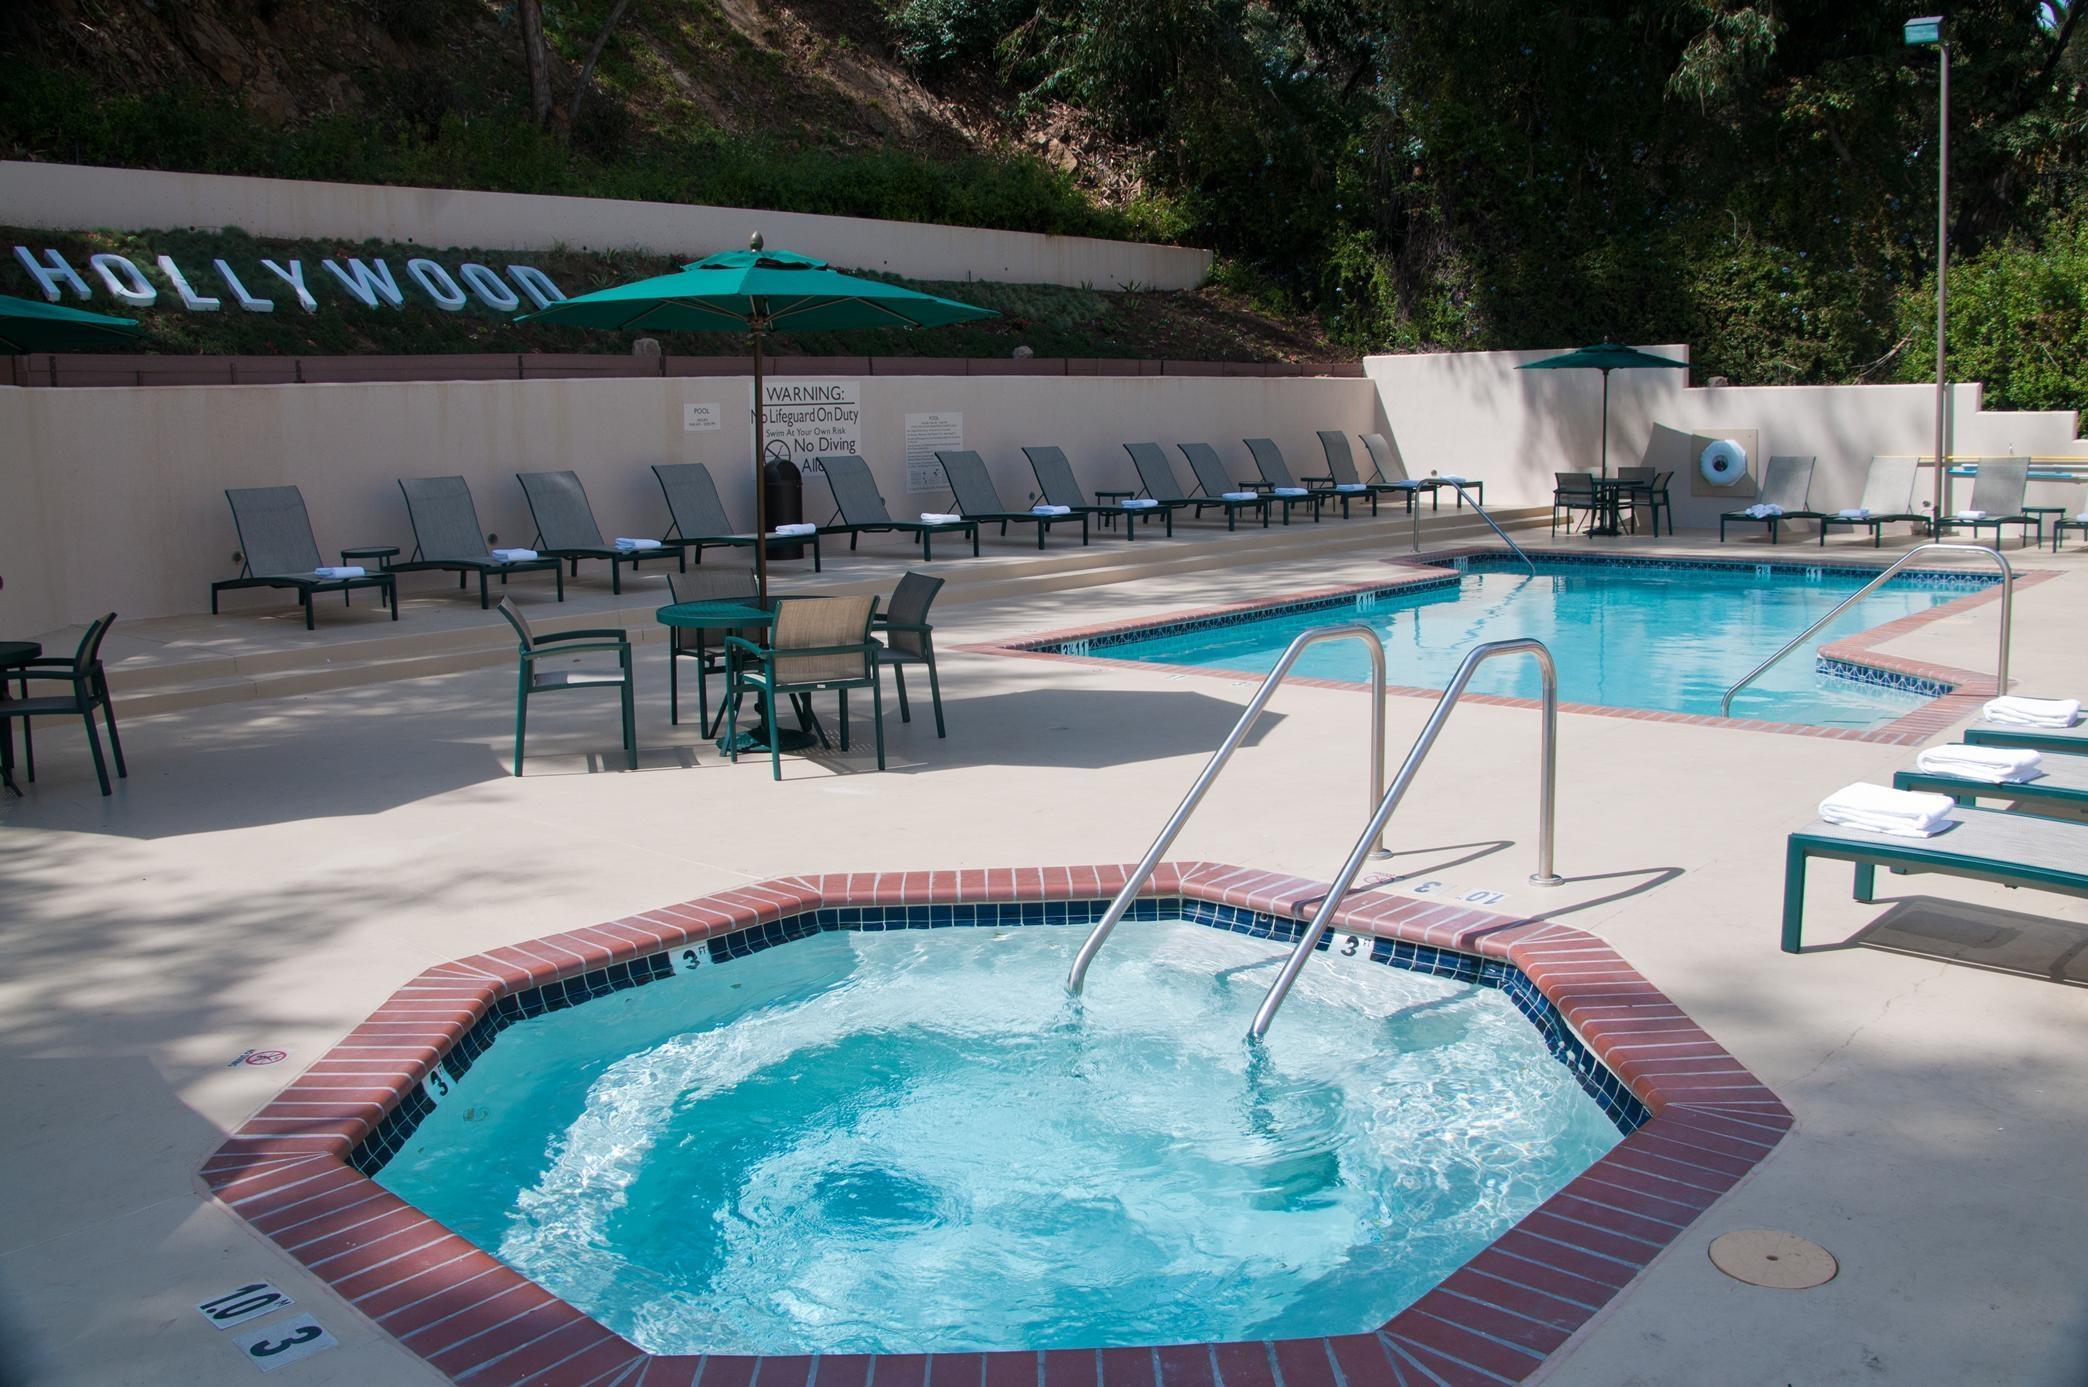 Hilton Garden Inn Los Angeles/Hollywood image 8